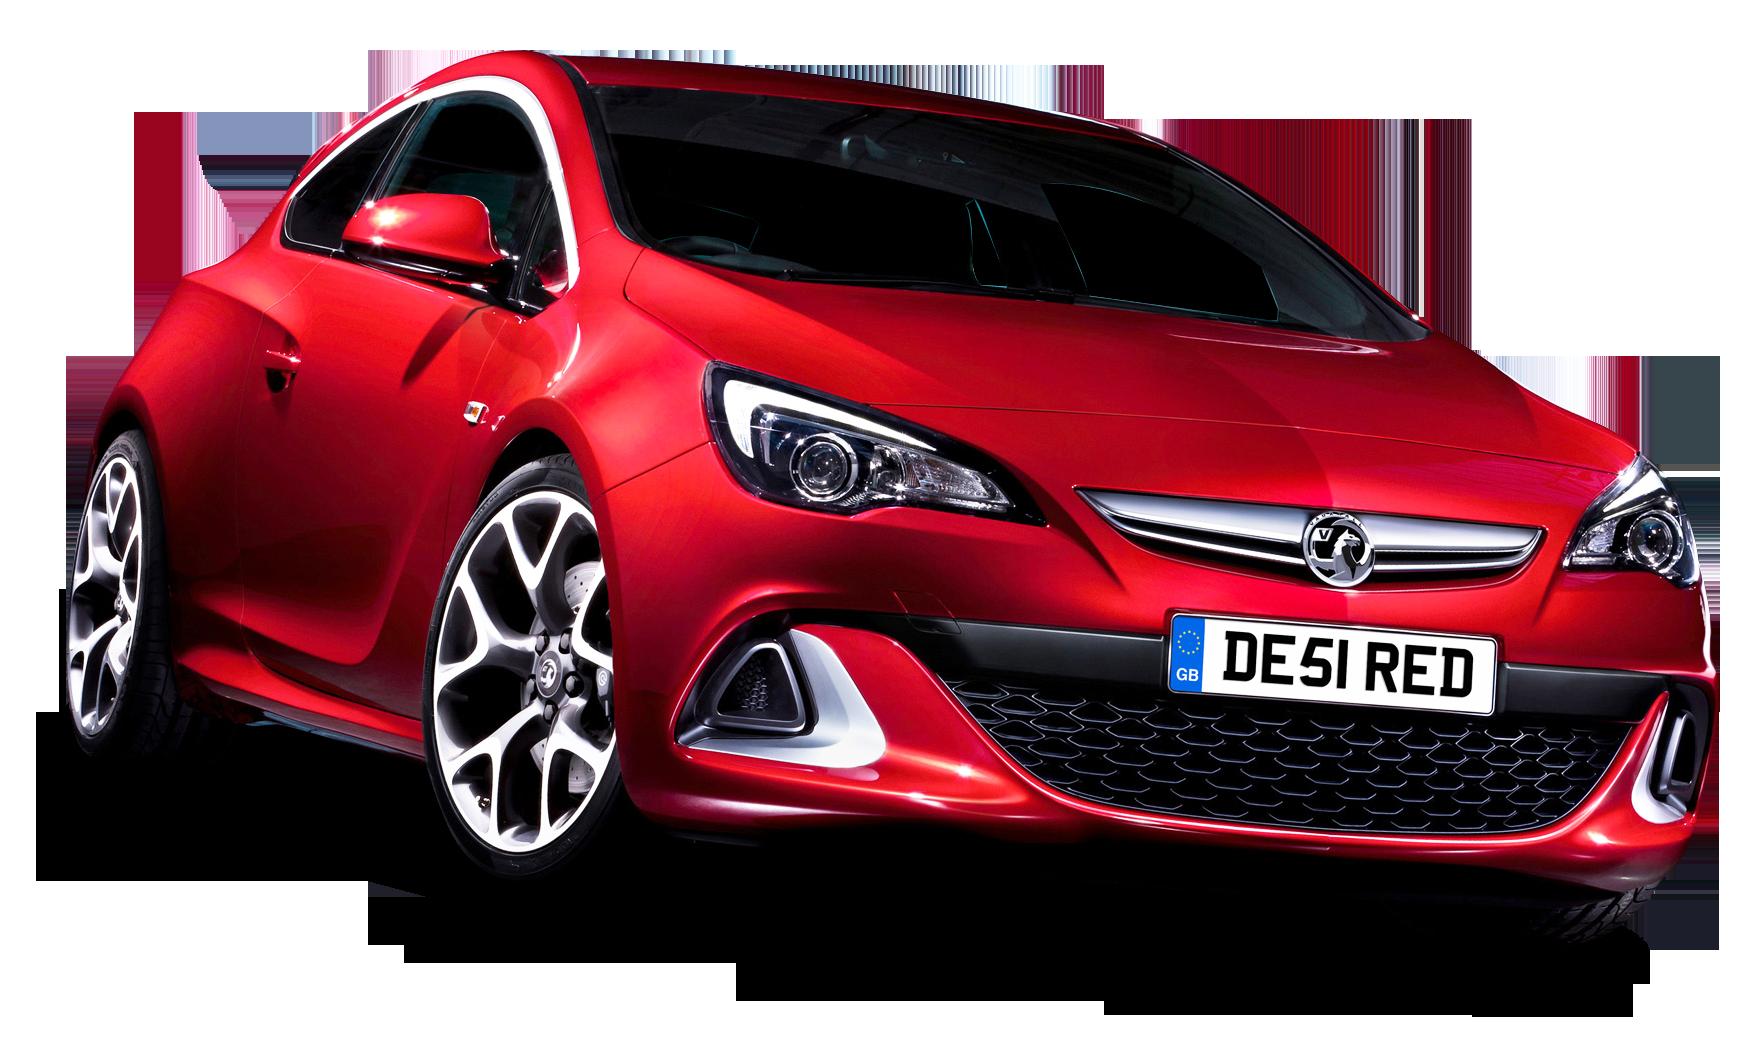 Red Vauxhall Astra VXR Car